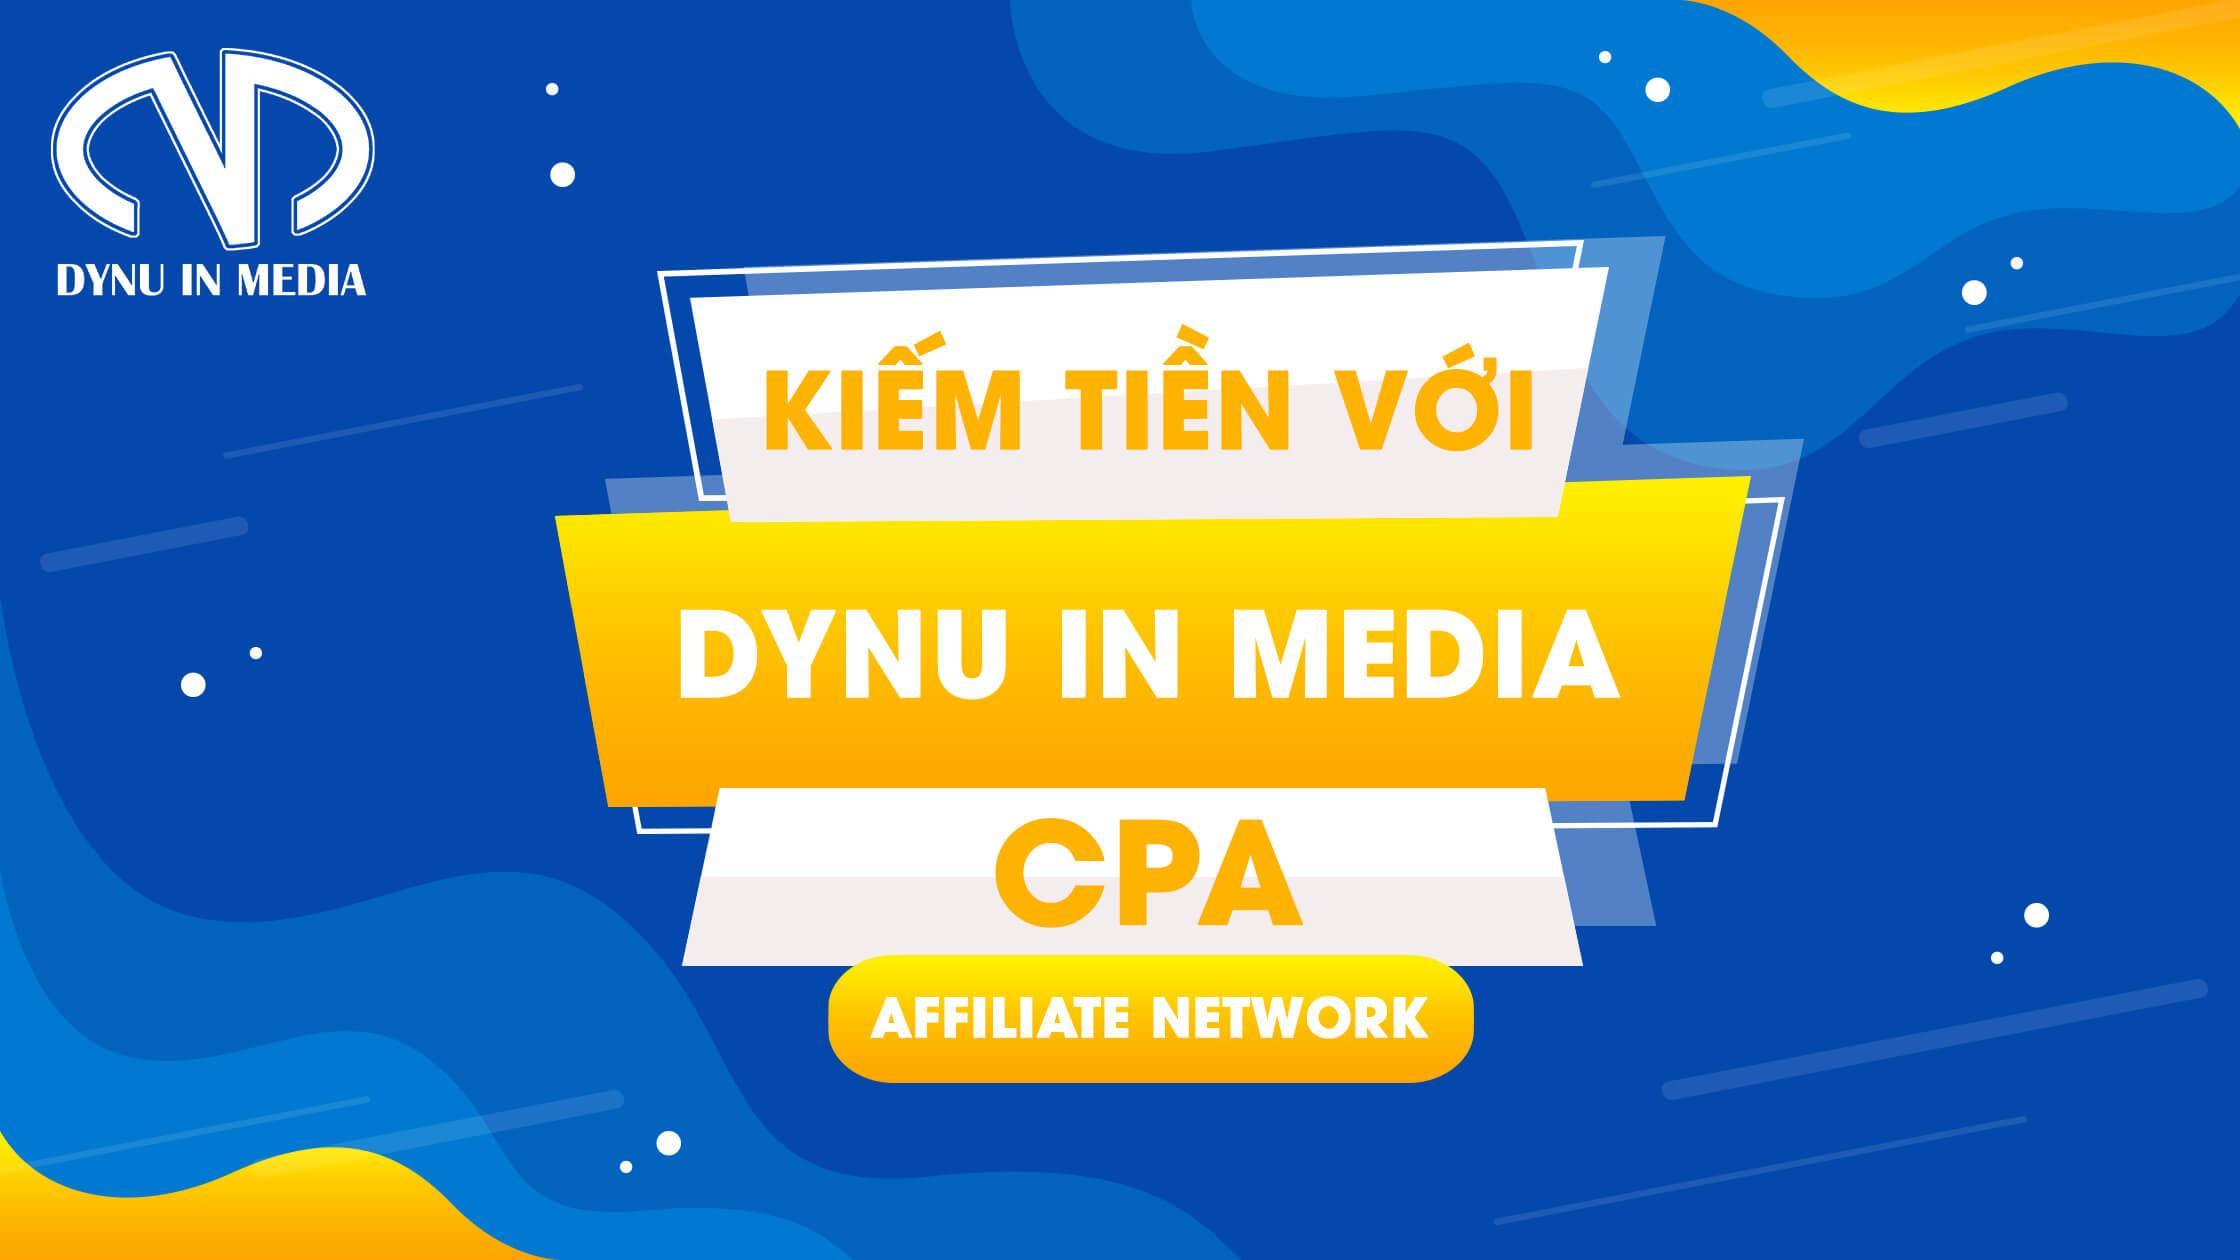 Kiếm tiền với DYNU IN MEDIA - CPA Affiliate Network